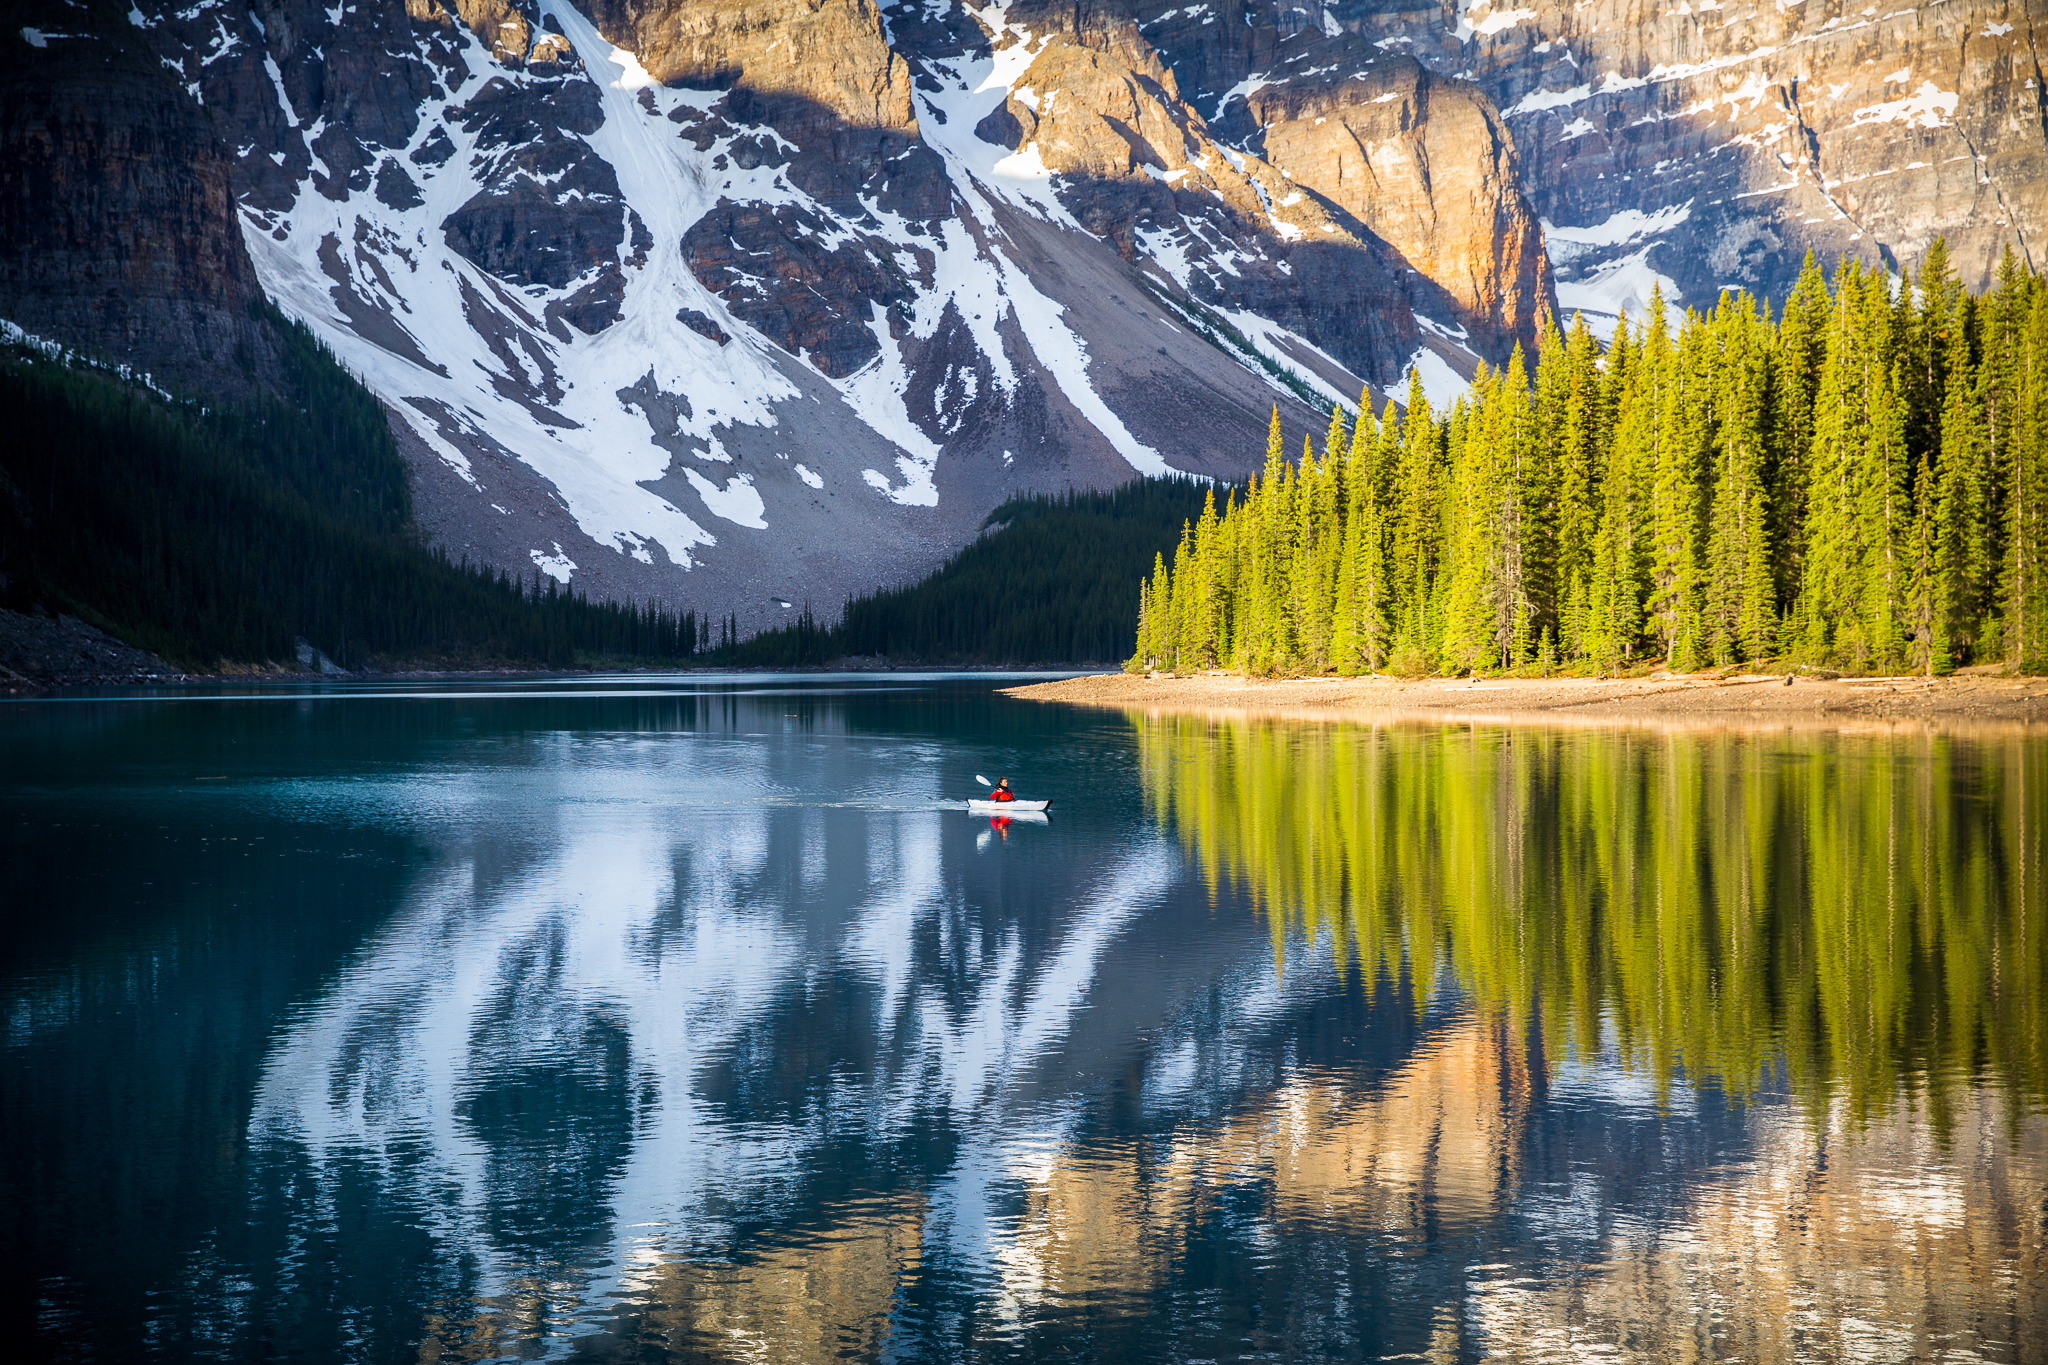 Moraine Lake - @taylormichaelburk copy.jpg